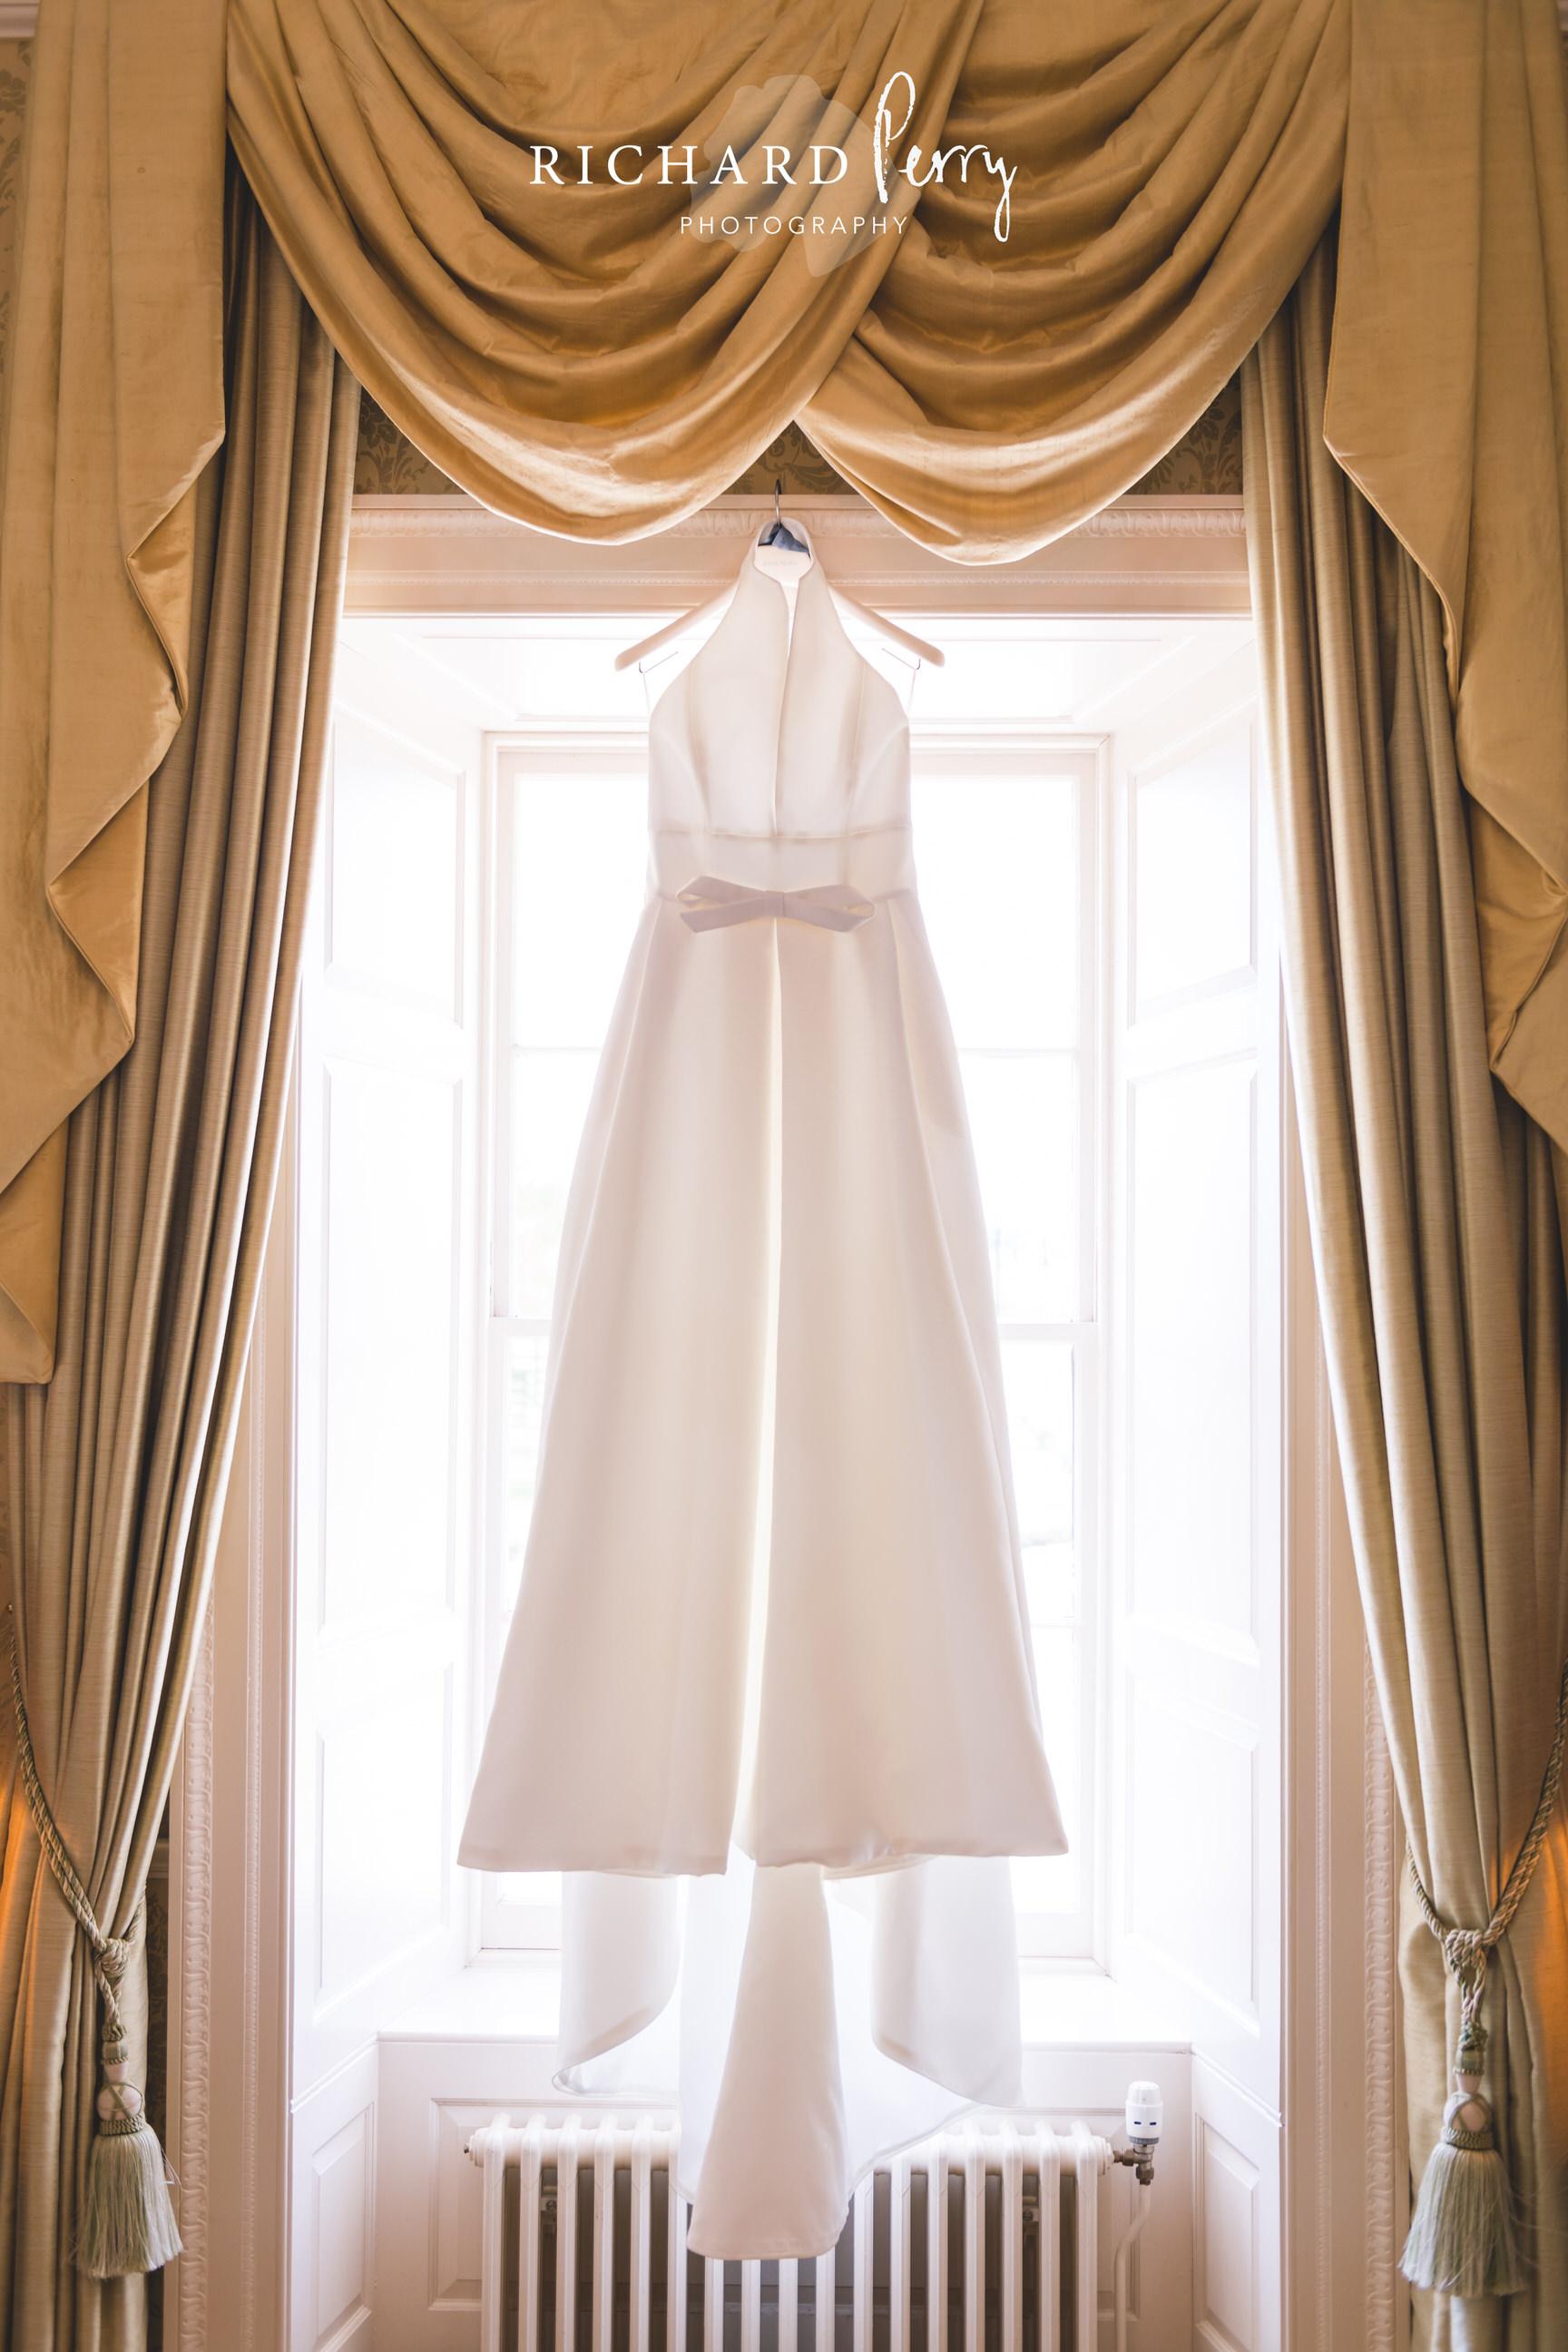 yorkshire-wedding-photographer-destination-archerfield-house-1.jpg